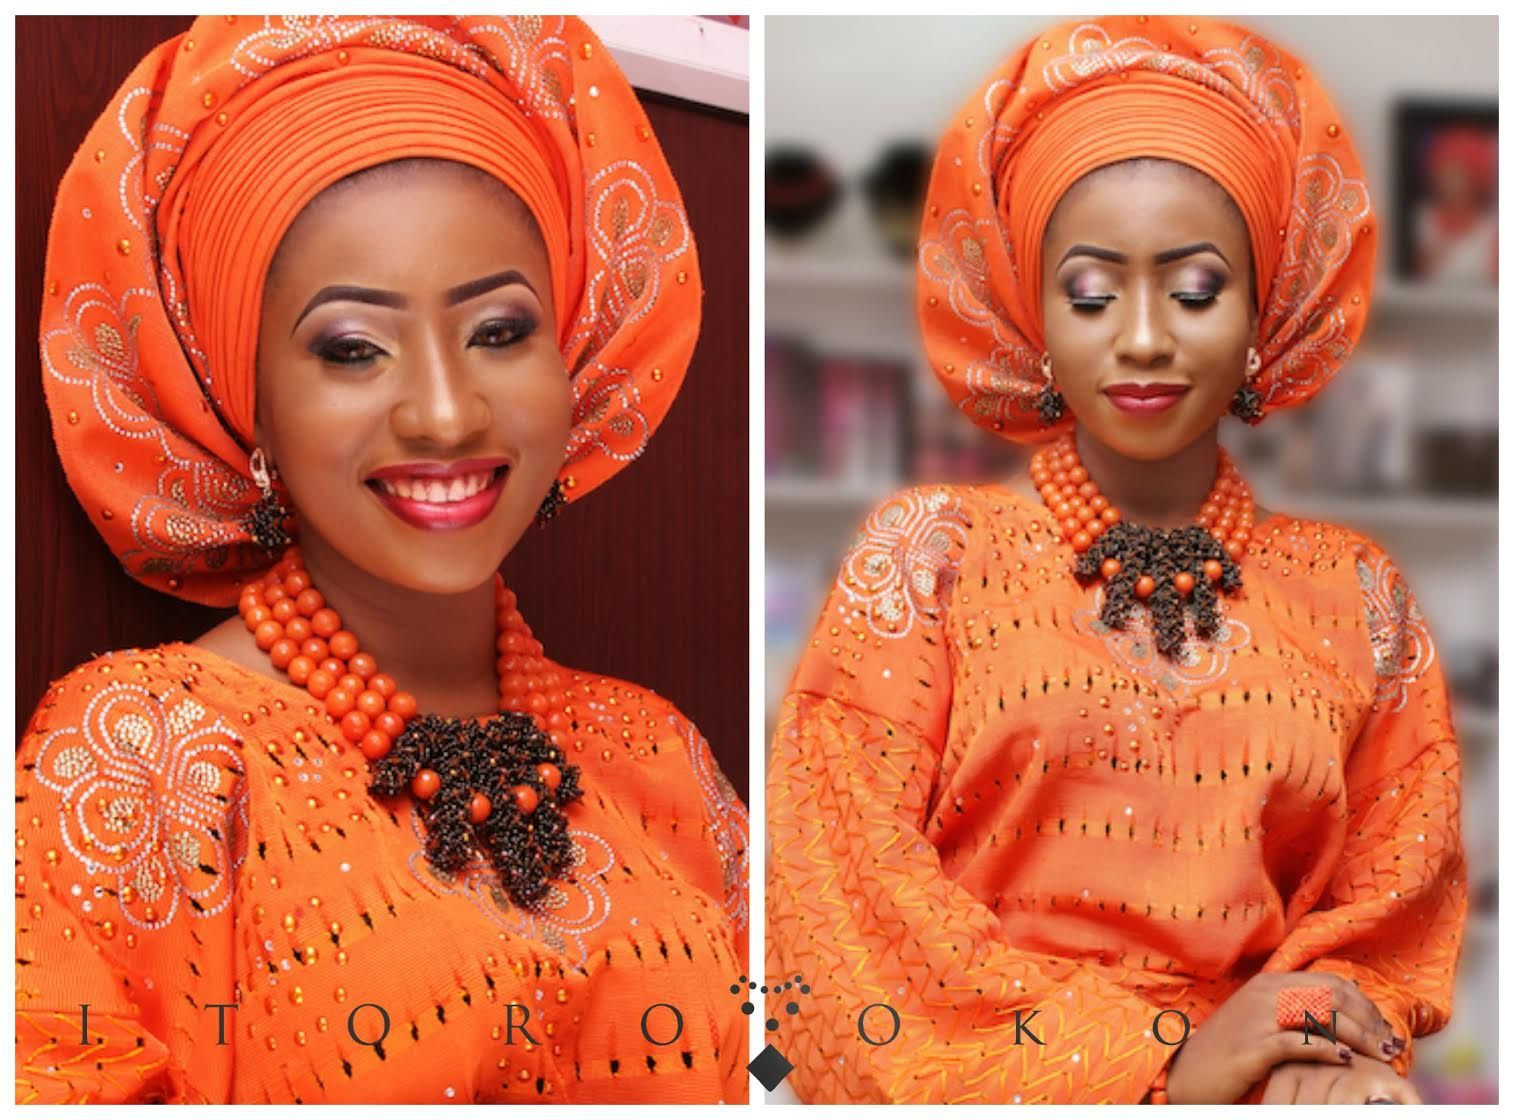 nigerian-wedding-beads-yoruba.jpg 1,514×1,120 pixels   Blessella ...